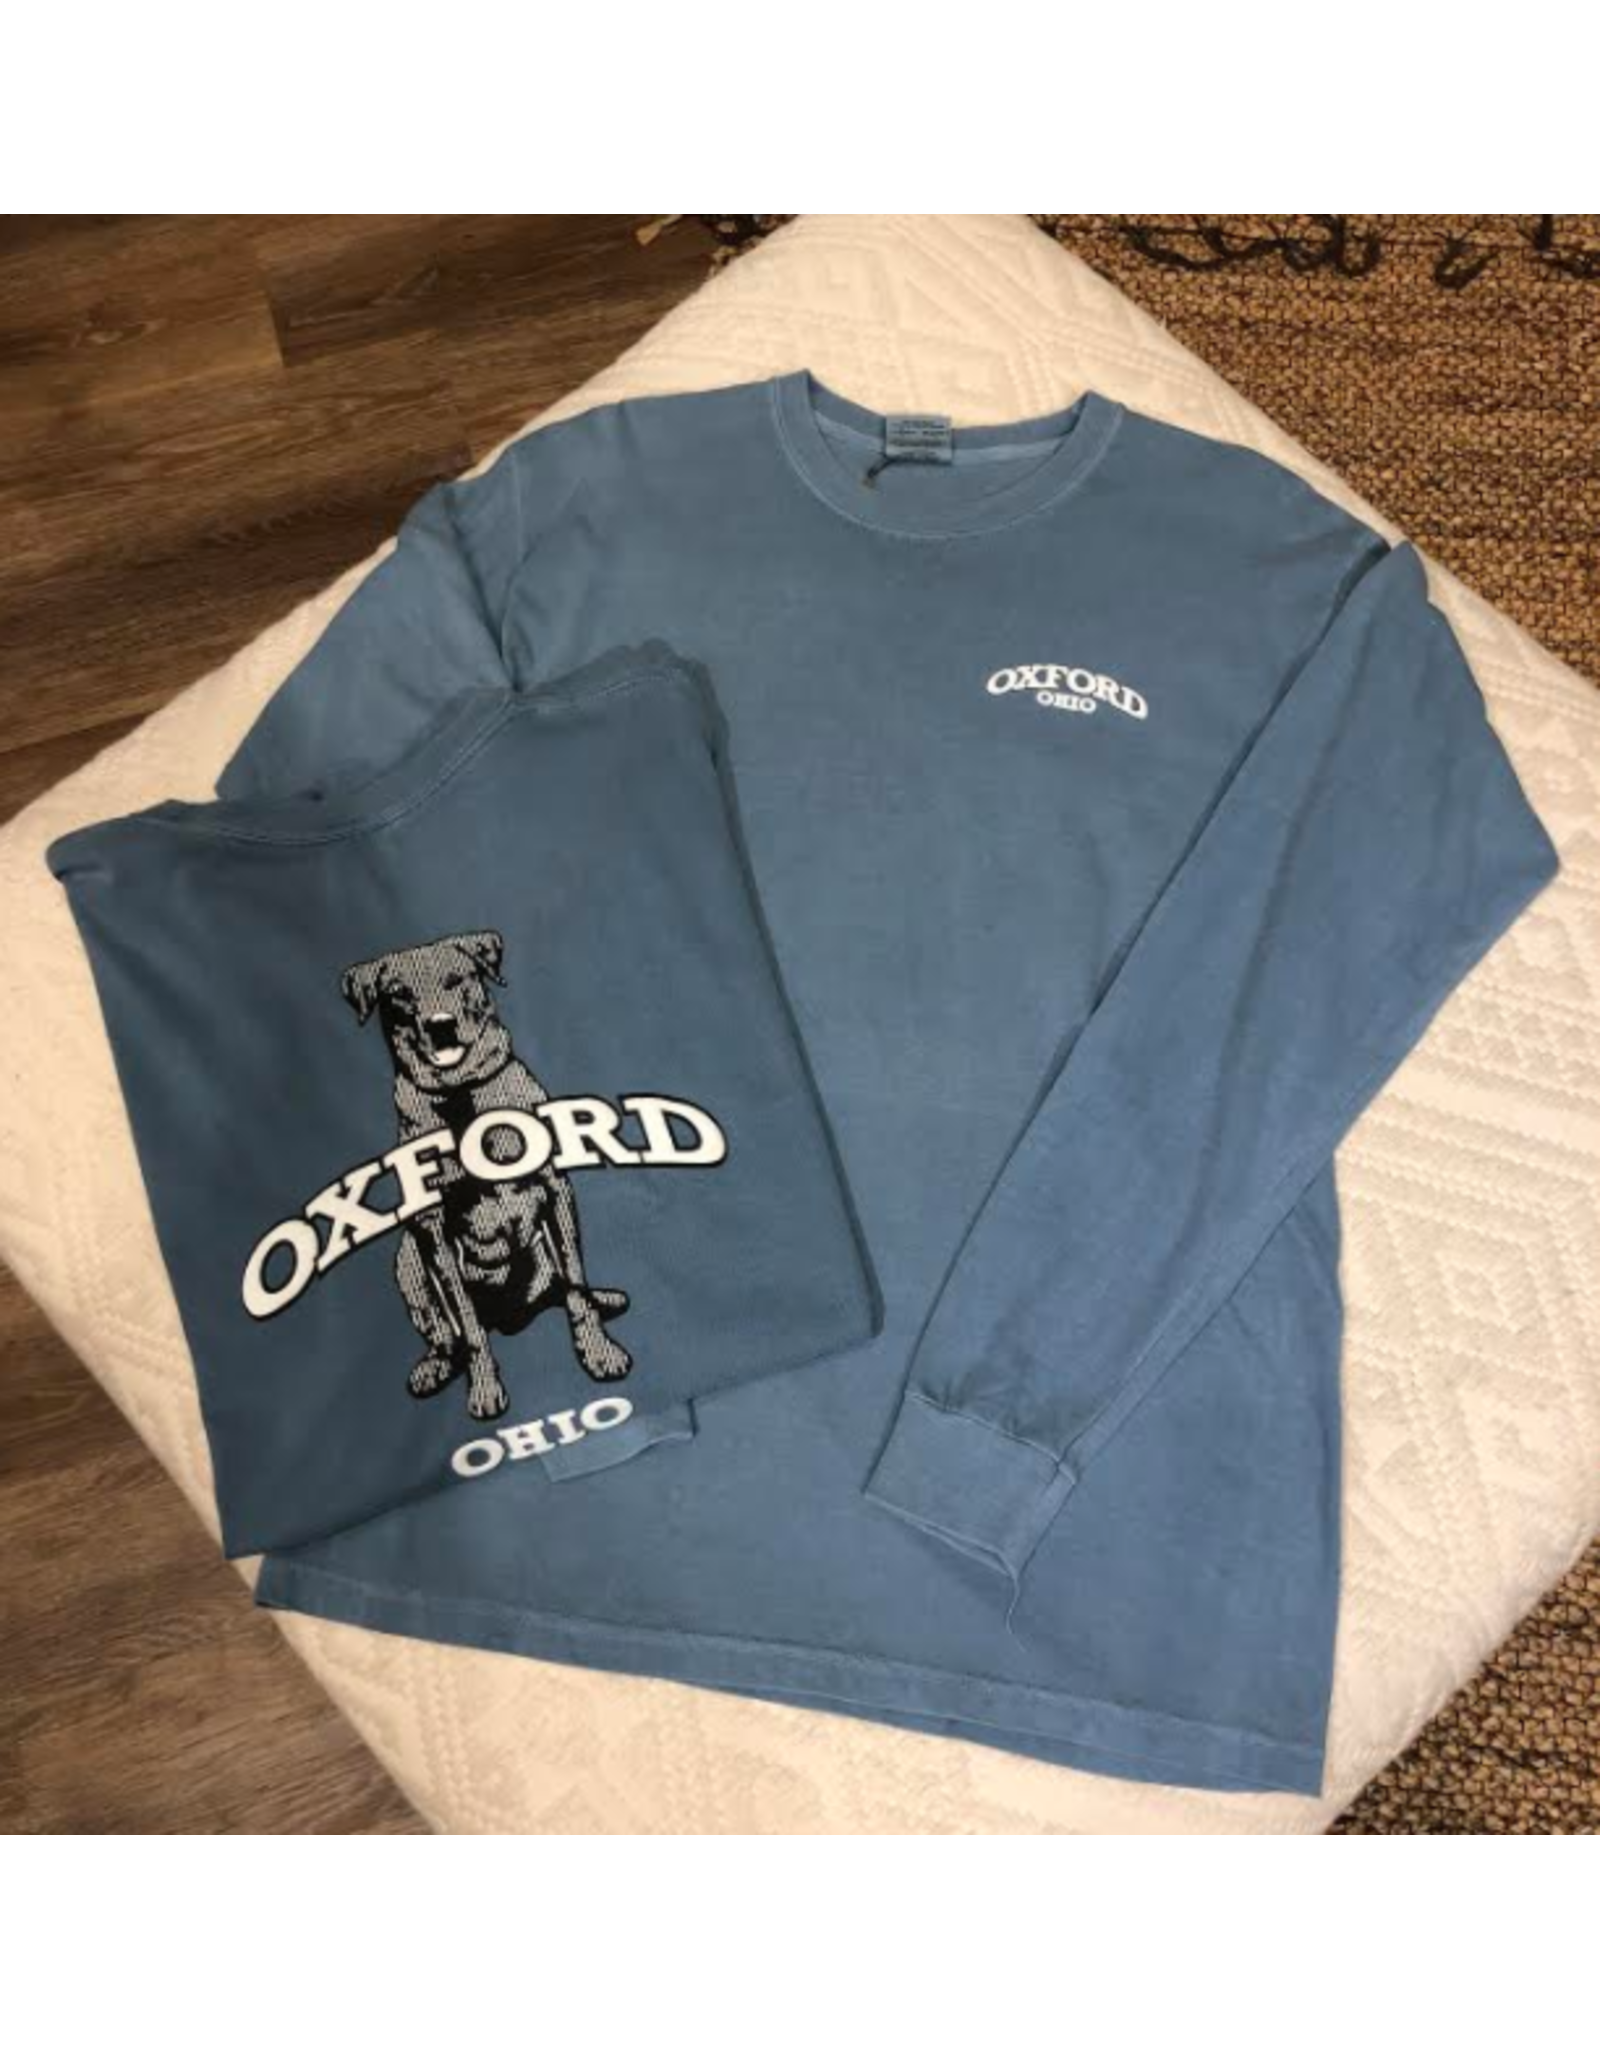 "Oxford"" LS Tee"